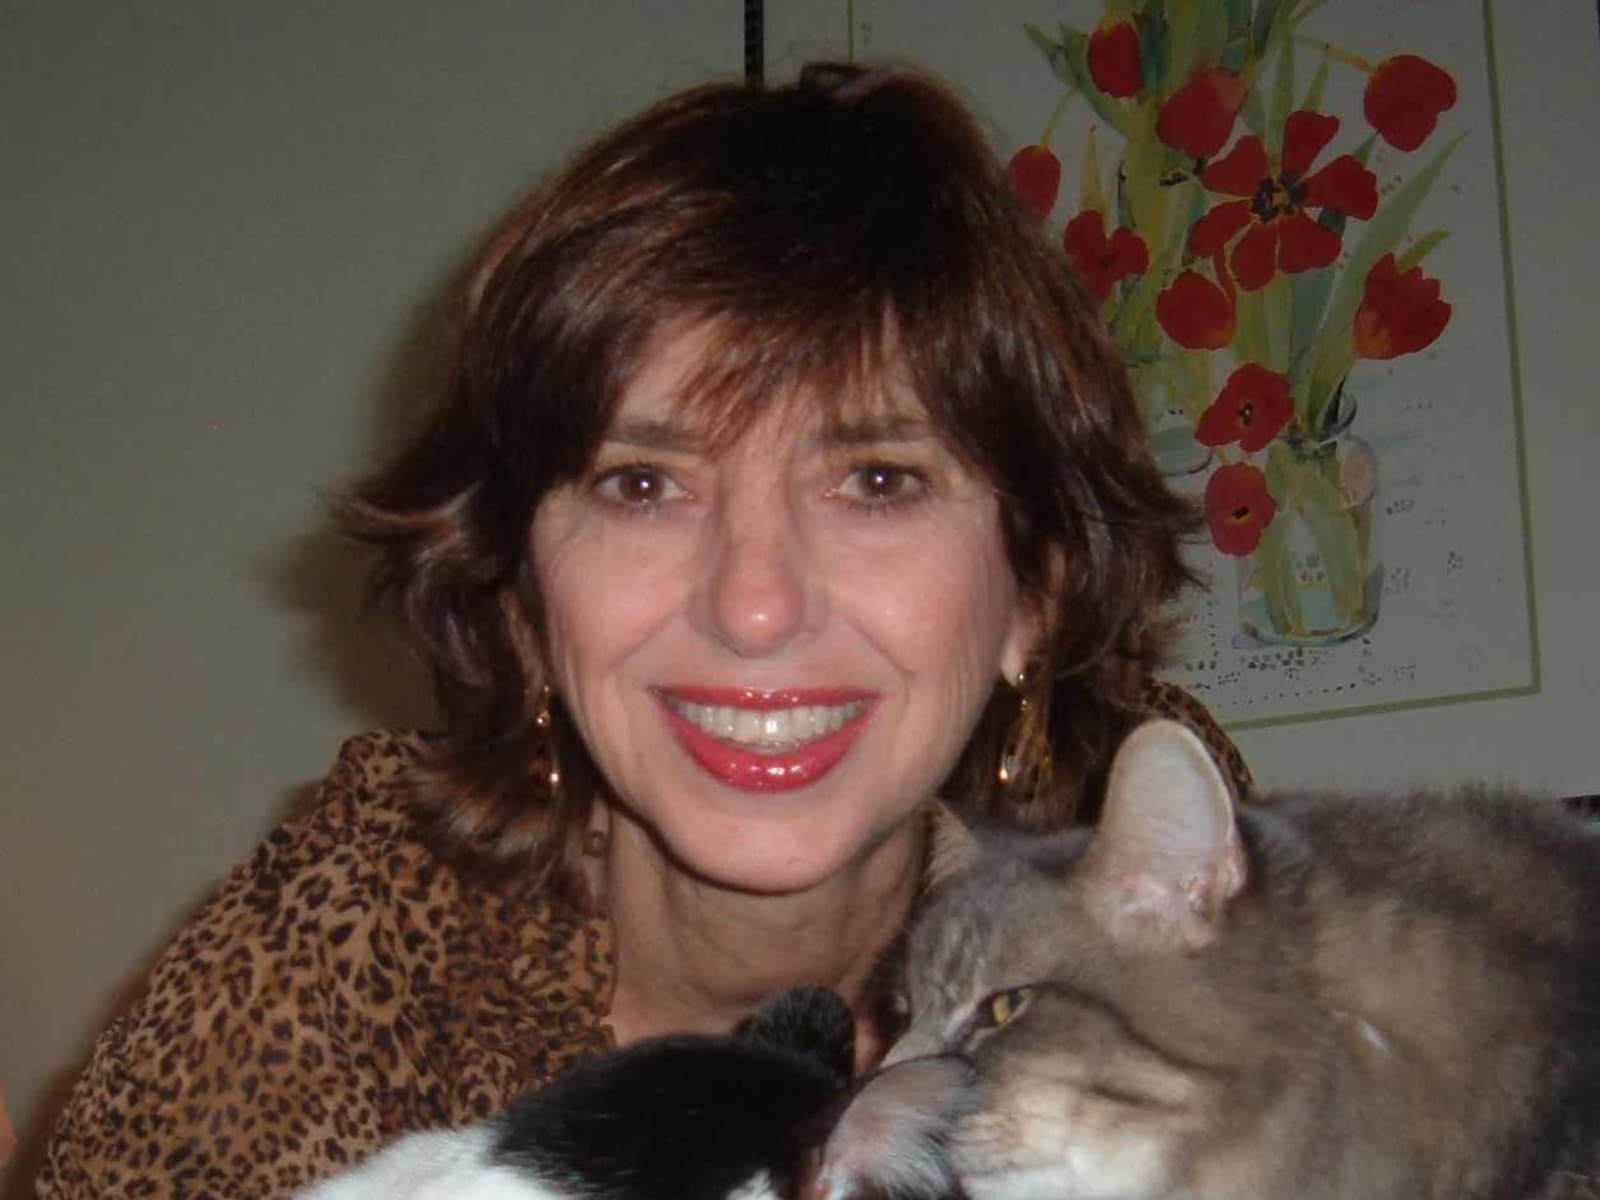 Gayle from Santa Rosa, California, United States